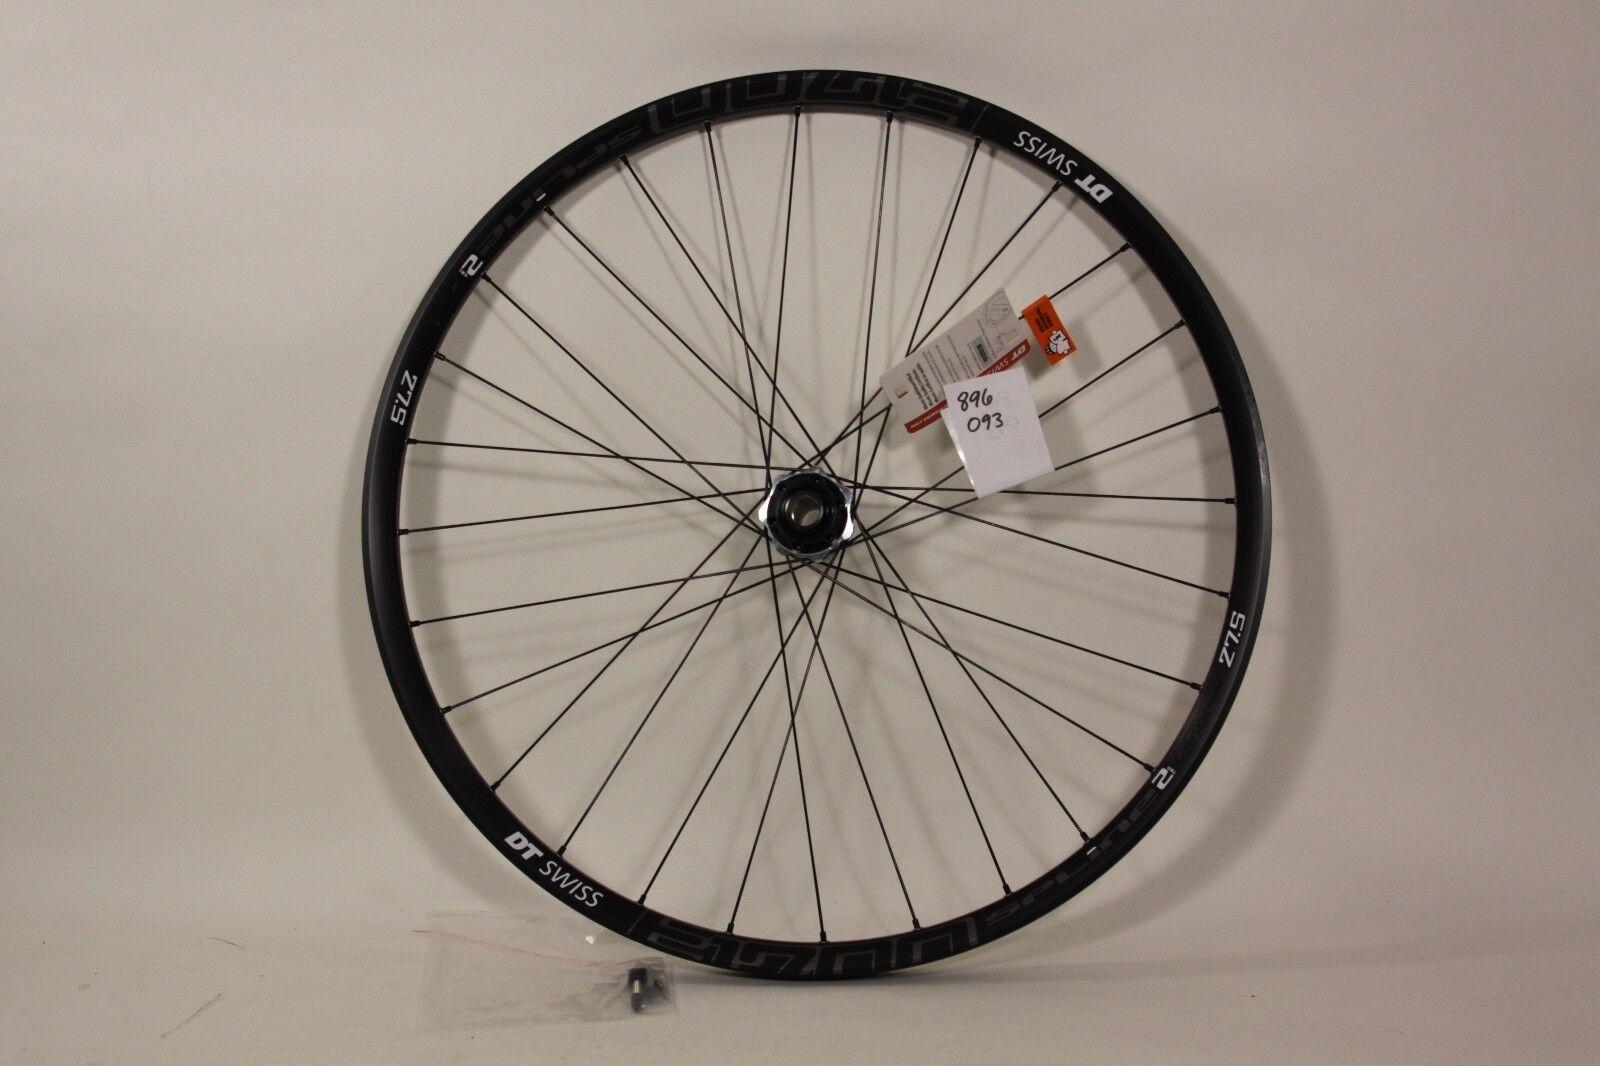 DT Swiss 27.5  Front Wheel E 1700 Spline2 20 x 110mm Axle 28h 6 bolt  896093